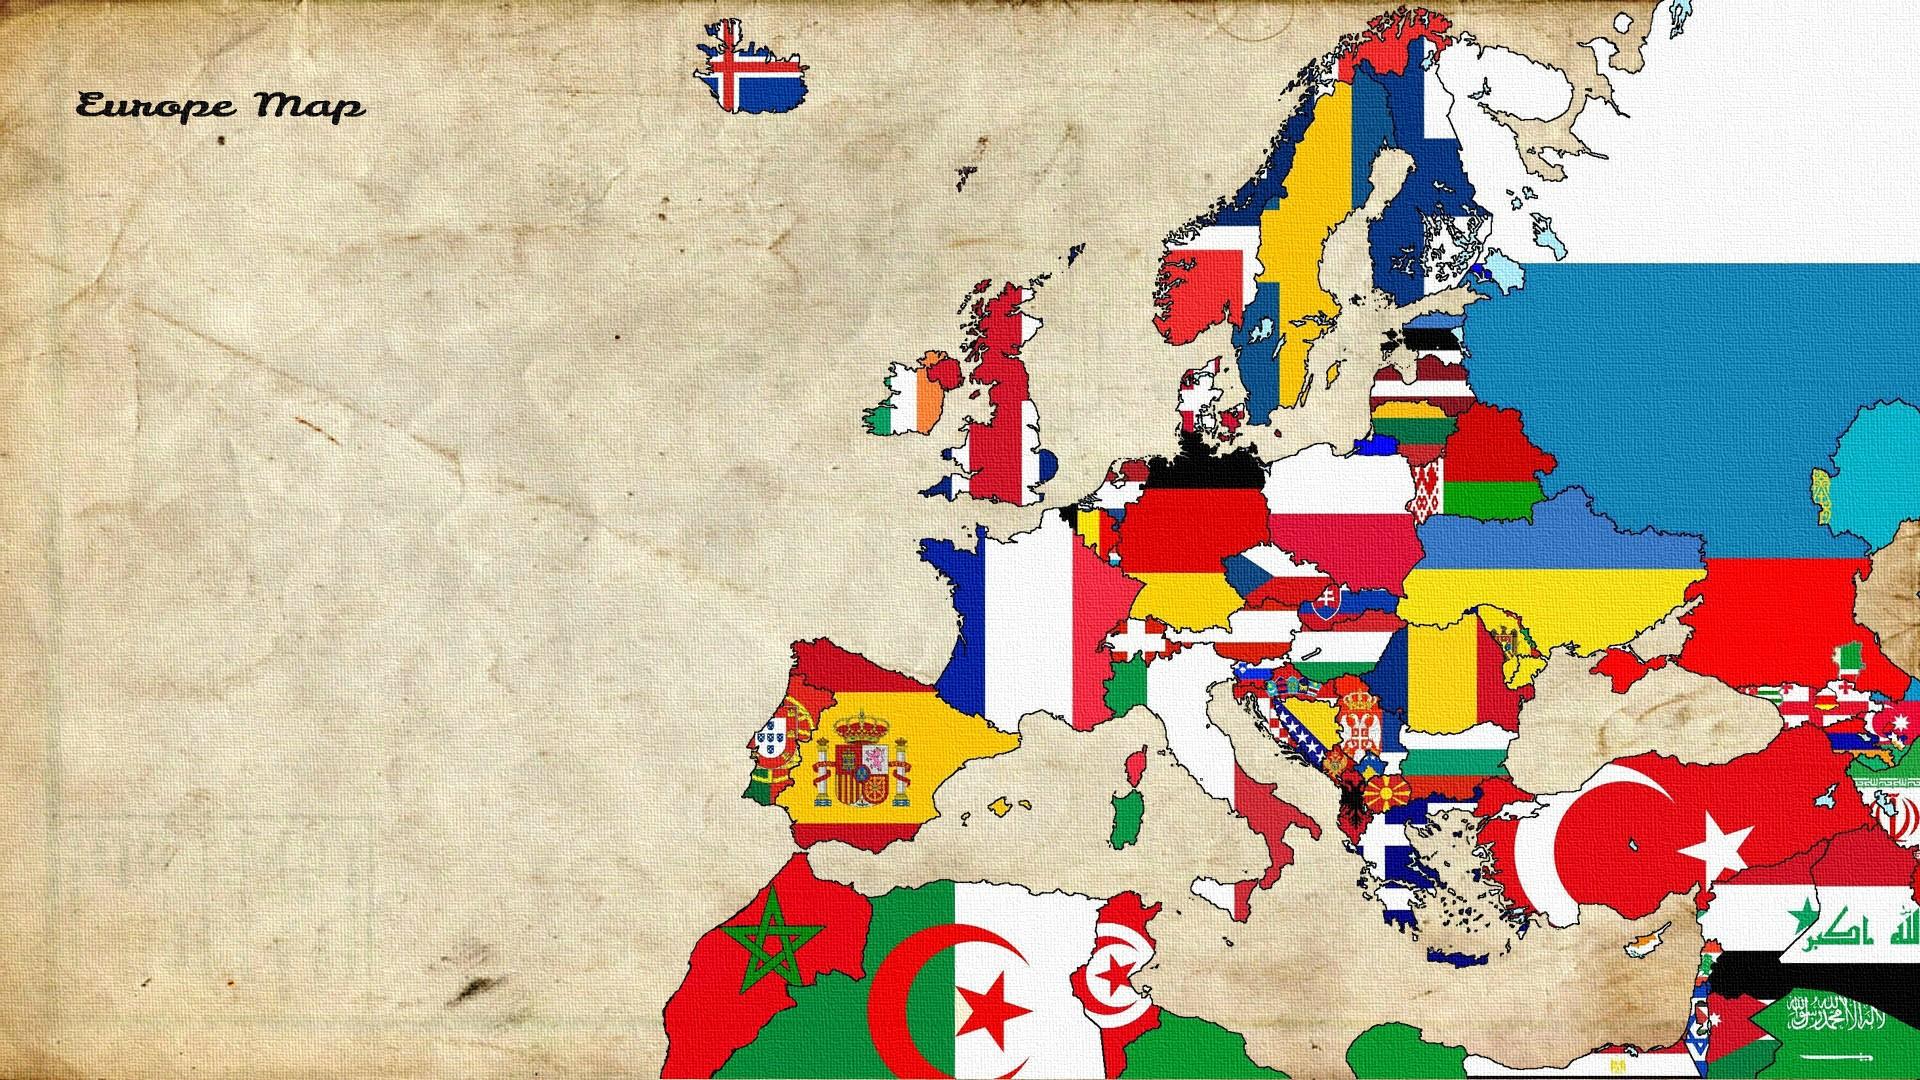 Wallpaper illustration collage cartoon flag europe world map illustration collage cartoon flag map europe world map play old map art child art gumiabroncs Gallery